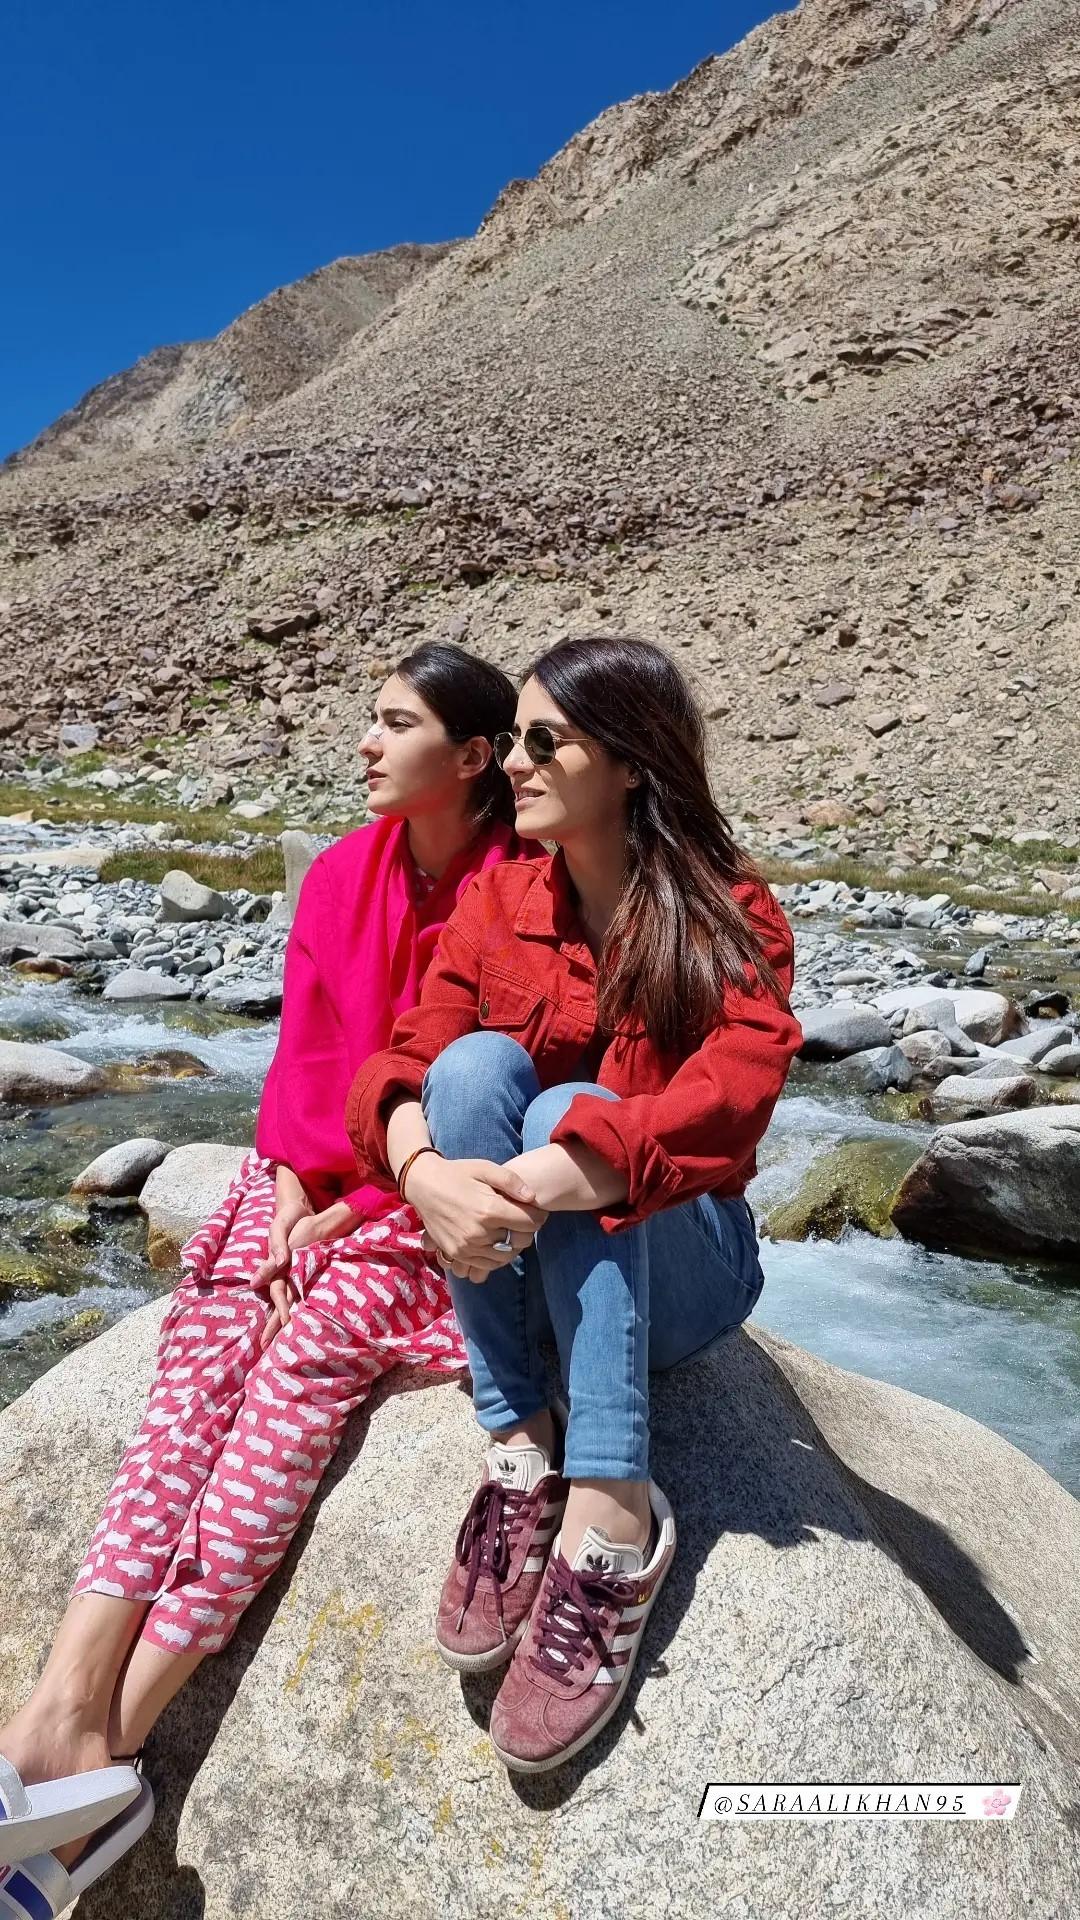 Sara Ali Khan and Radhika Madan in Ladakh(Instagram/radhikamadan)